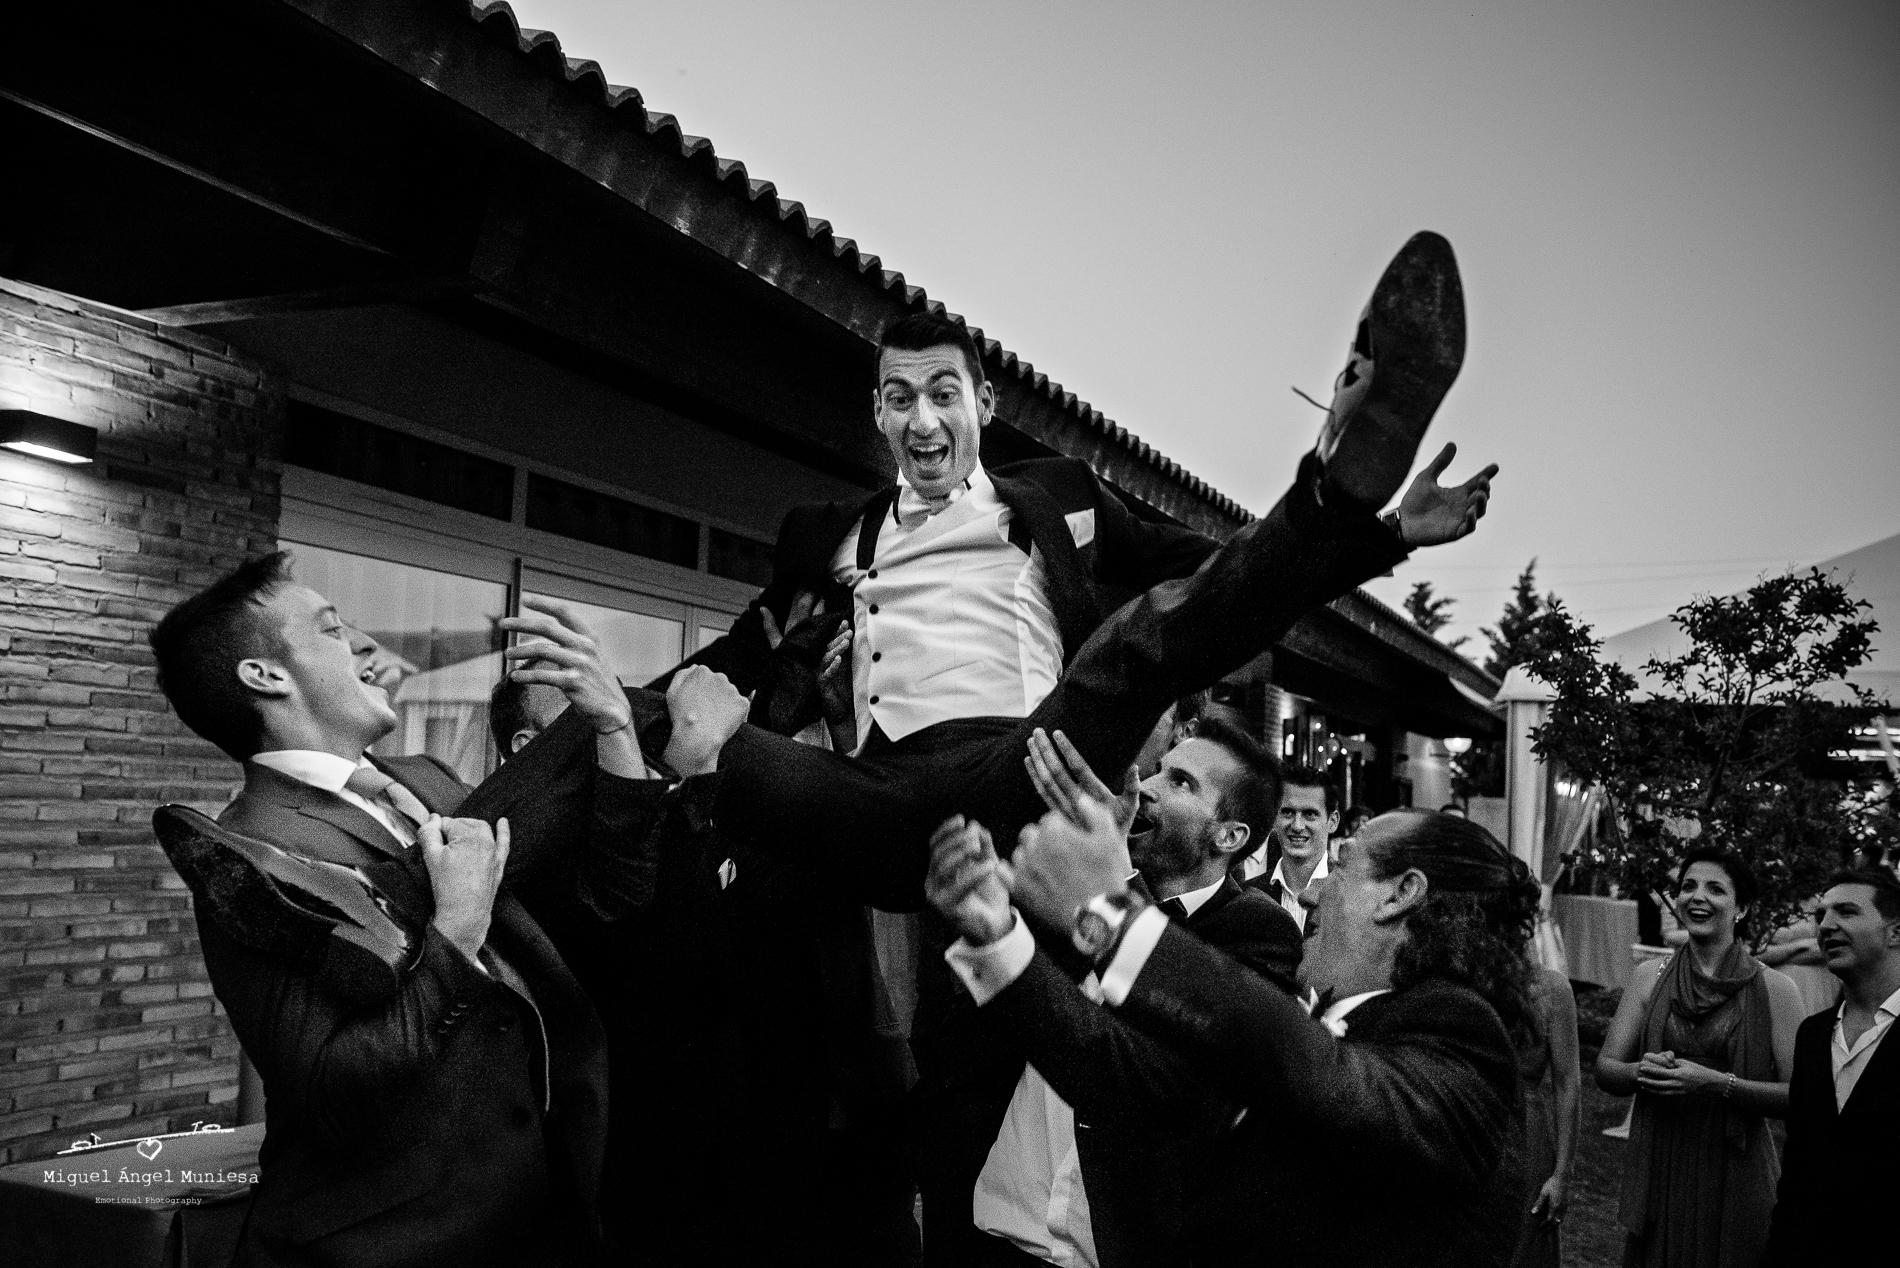 boda, fotografia de boda, boda zaragoza, fotografia, wedding, wedding photography, miguel angel muniesa, fotografo boda Zaragoza, fotografo boda, destination wedding_ 037